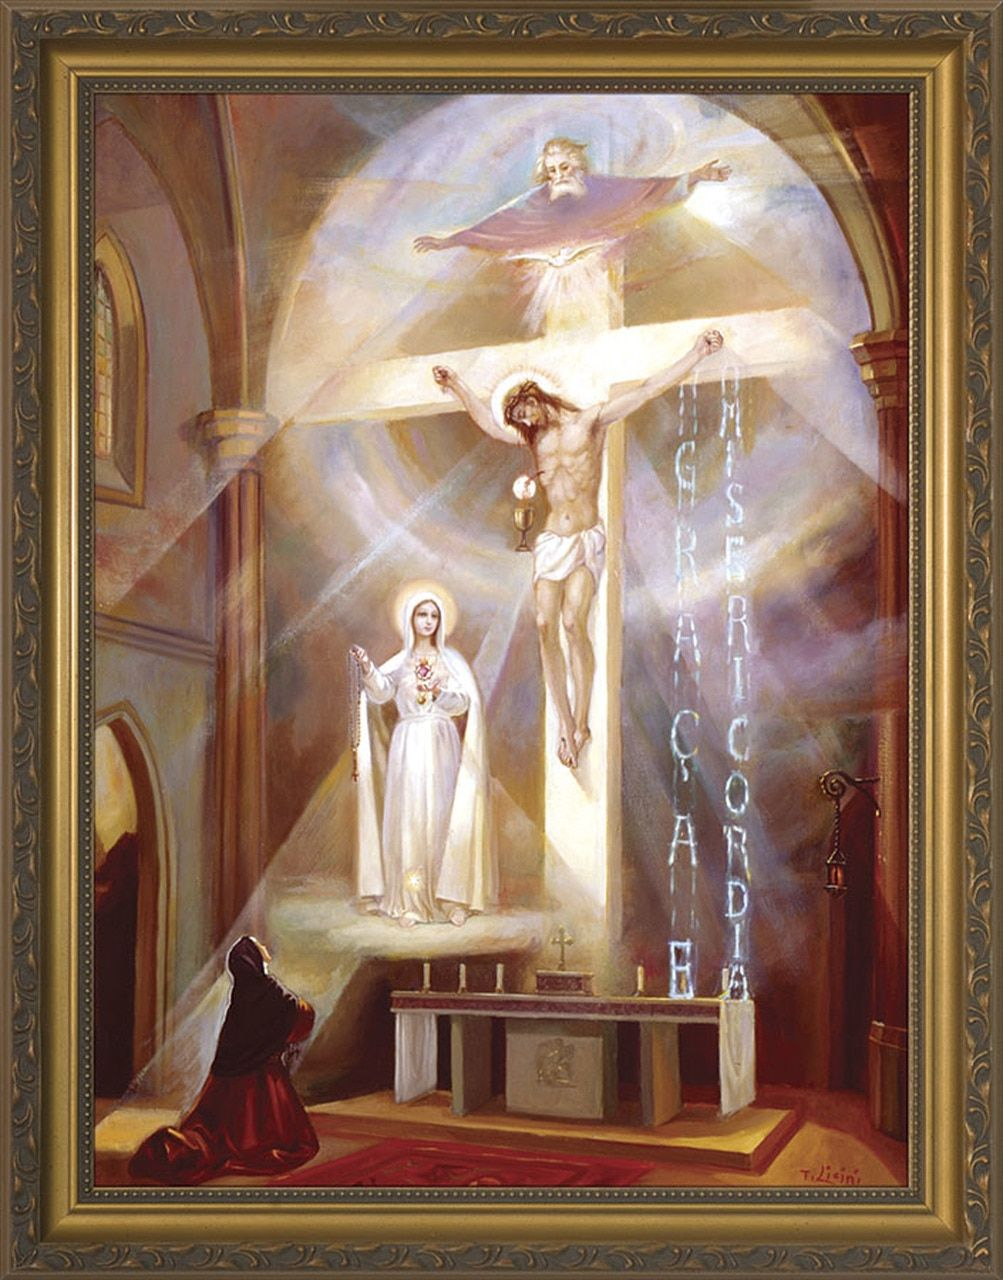 Last Vision of Fatima Framed Art - Gold Frame - Catholic to the Max - Online Catholic Store